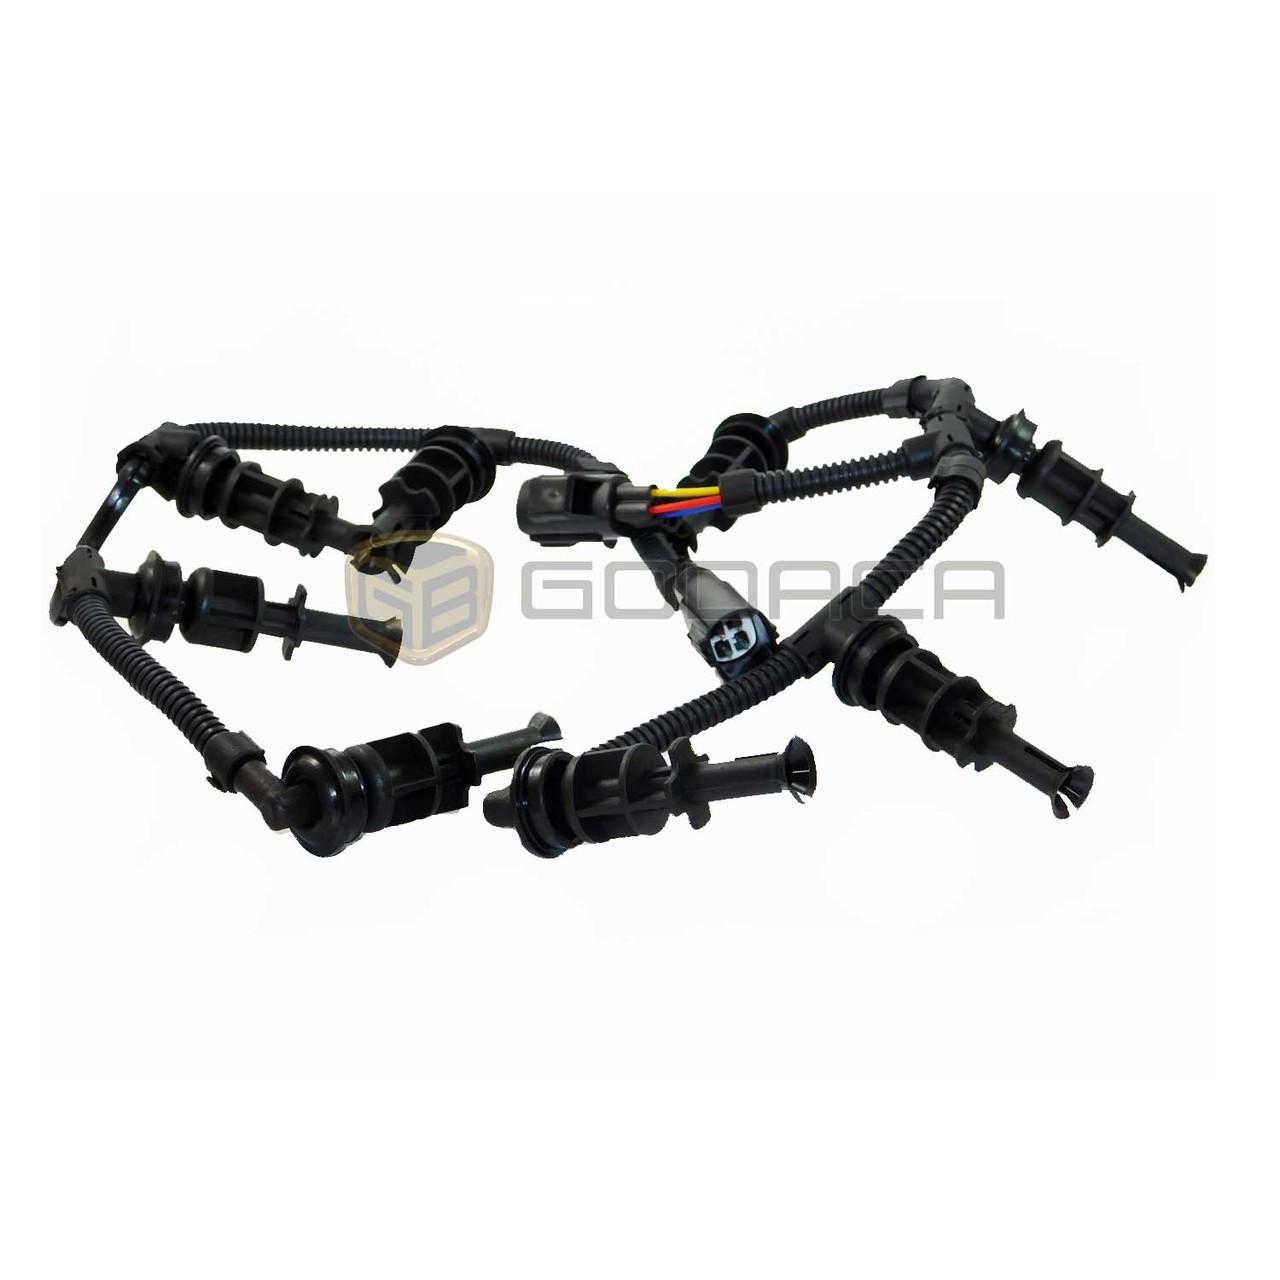 1x set wiring harness for 08 10 ford f350 6 4l powerstroke glow plug [ 1280 x 1280 Pixel ]